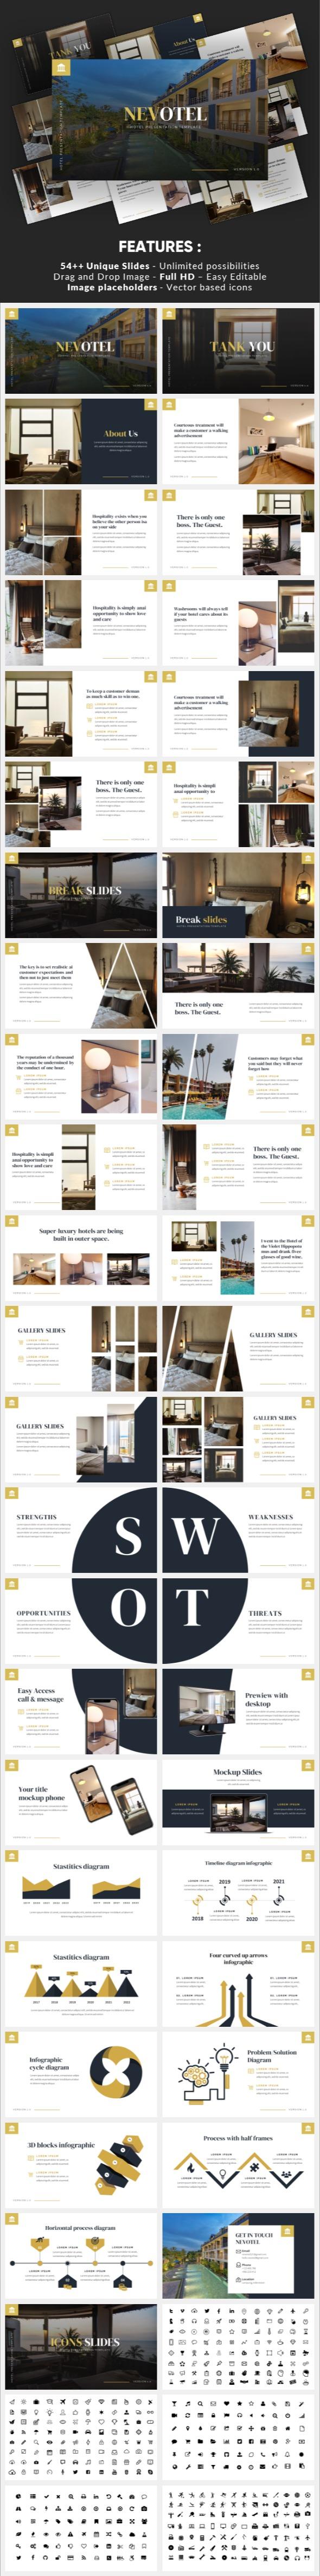 Nevotel - Luxury Hotel Powerpoint Template